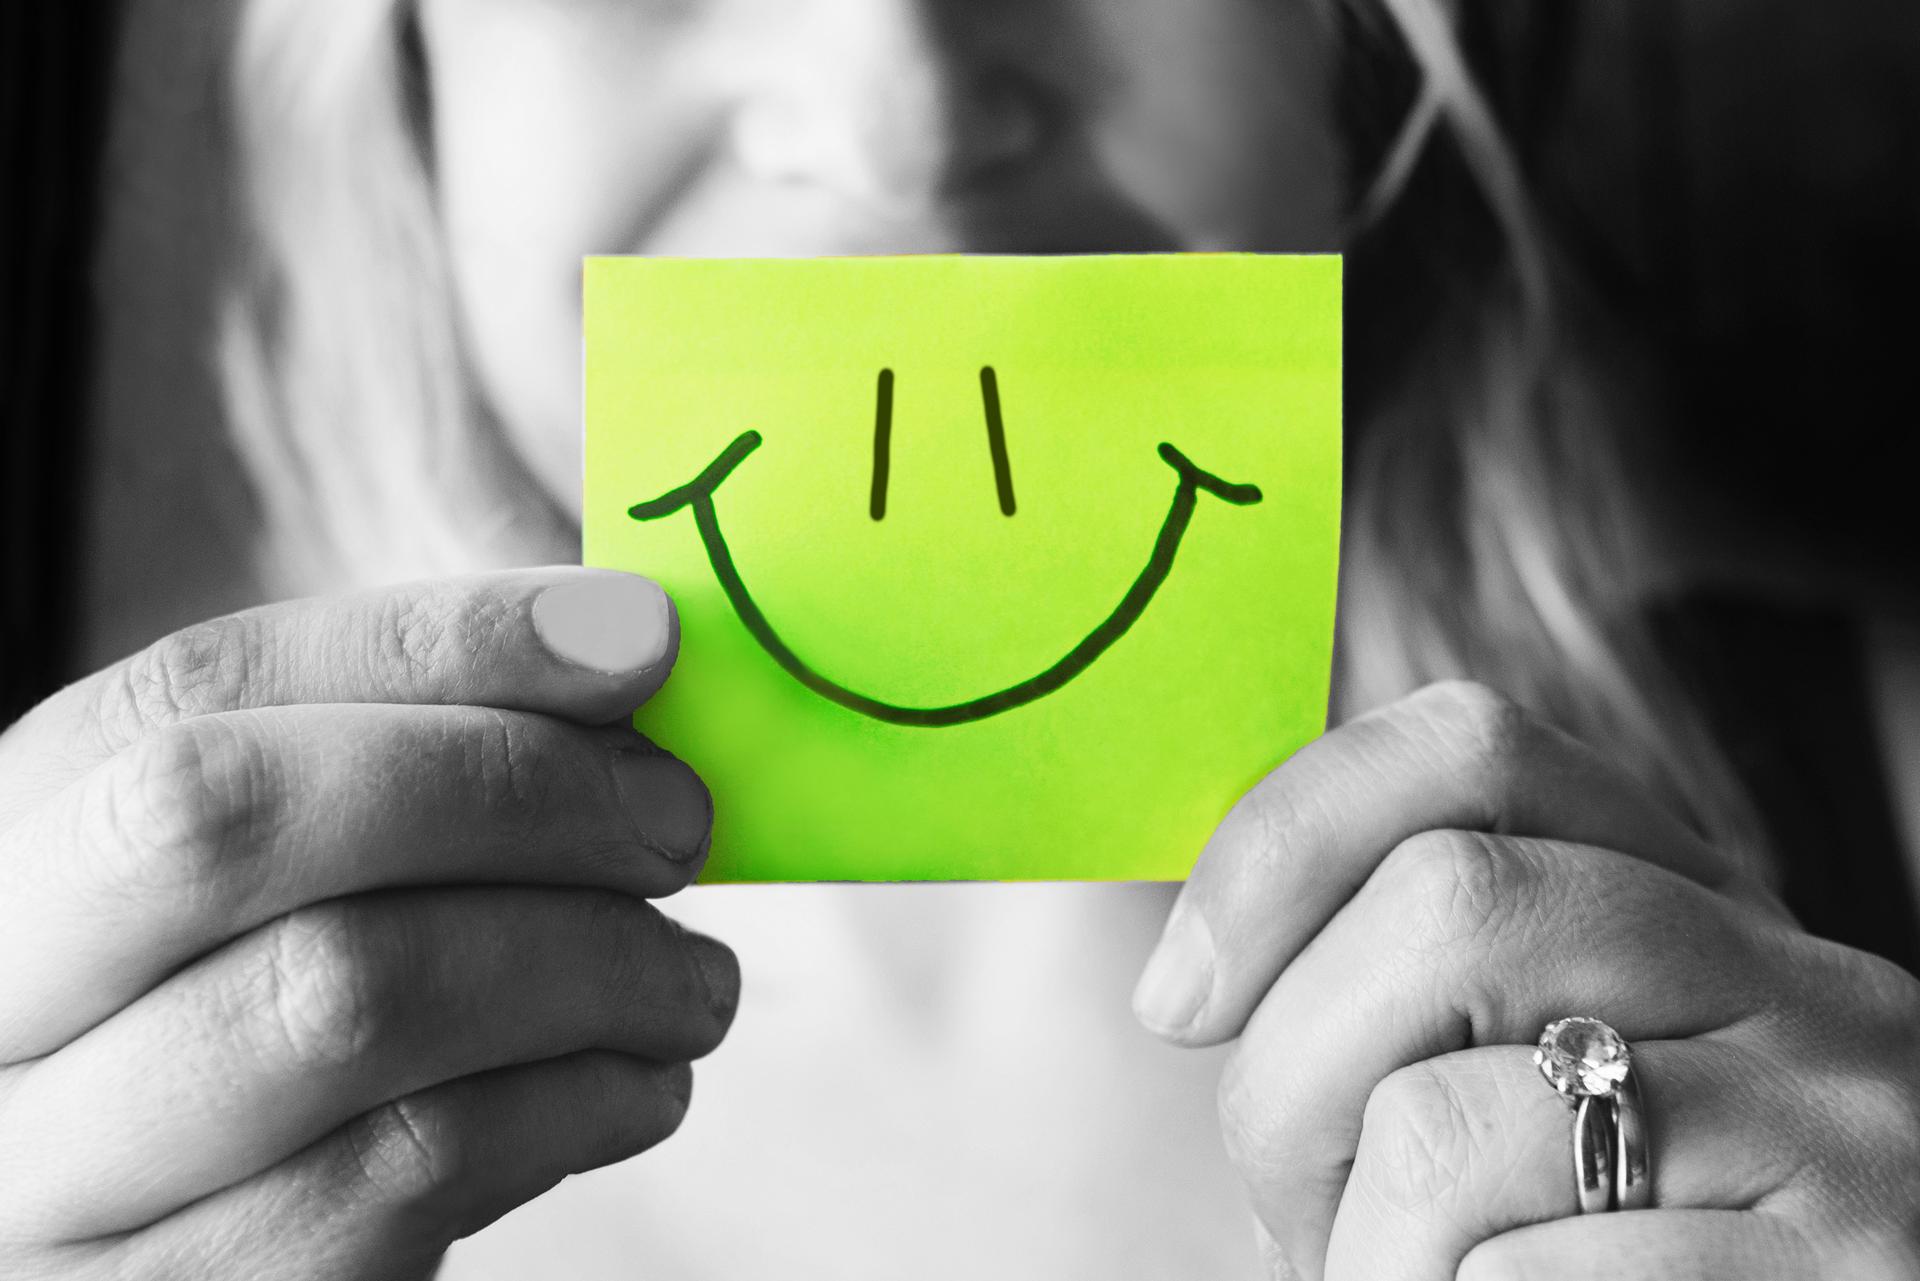 Telegraafi muistilappu smile